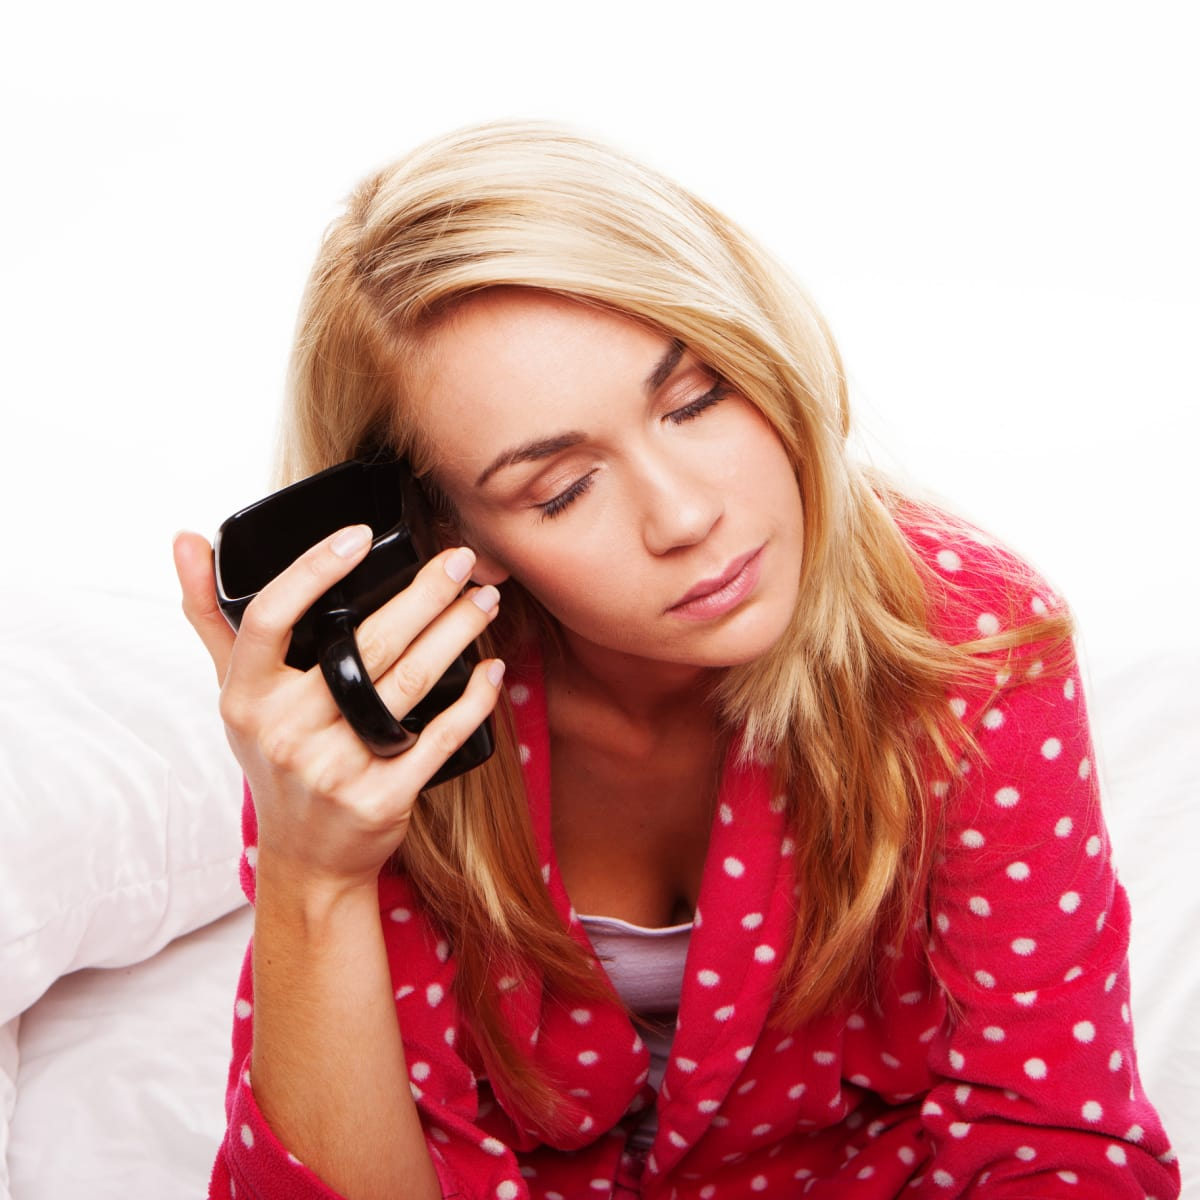 Hotze Health & Wellness Sleeplessness